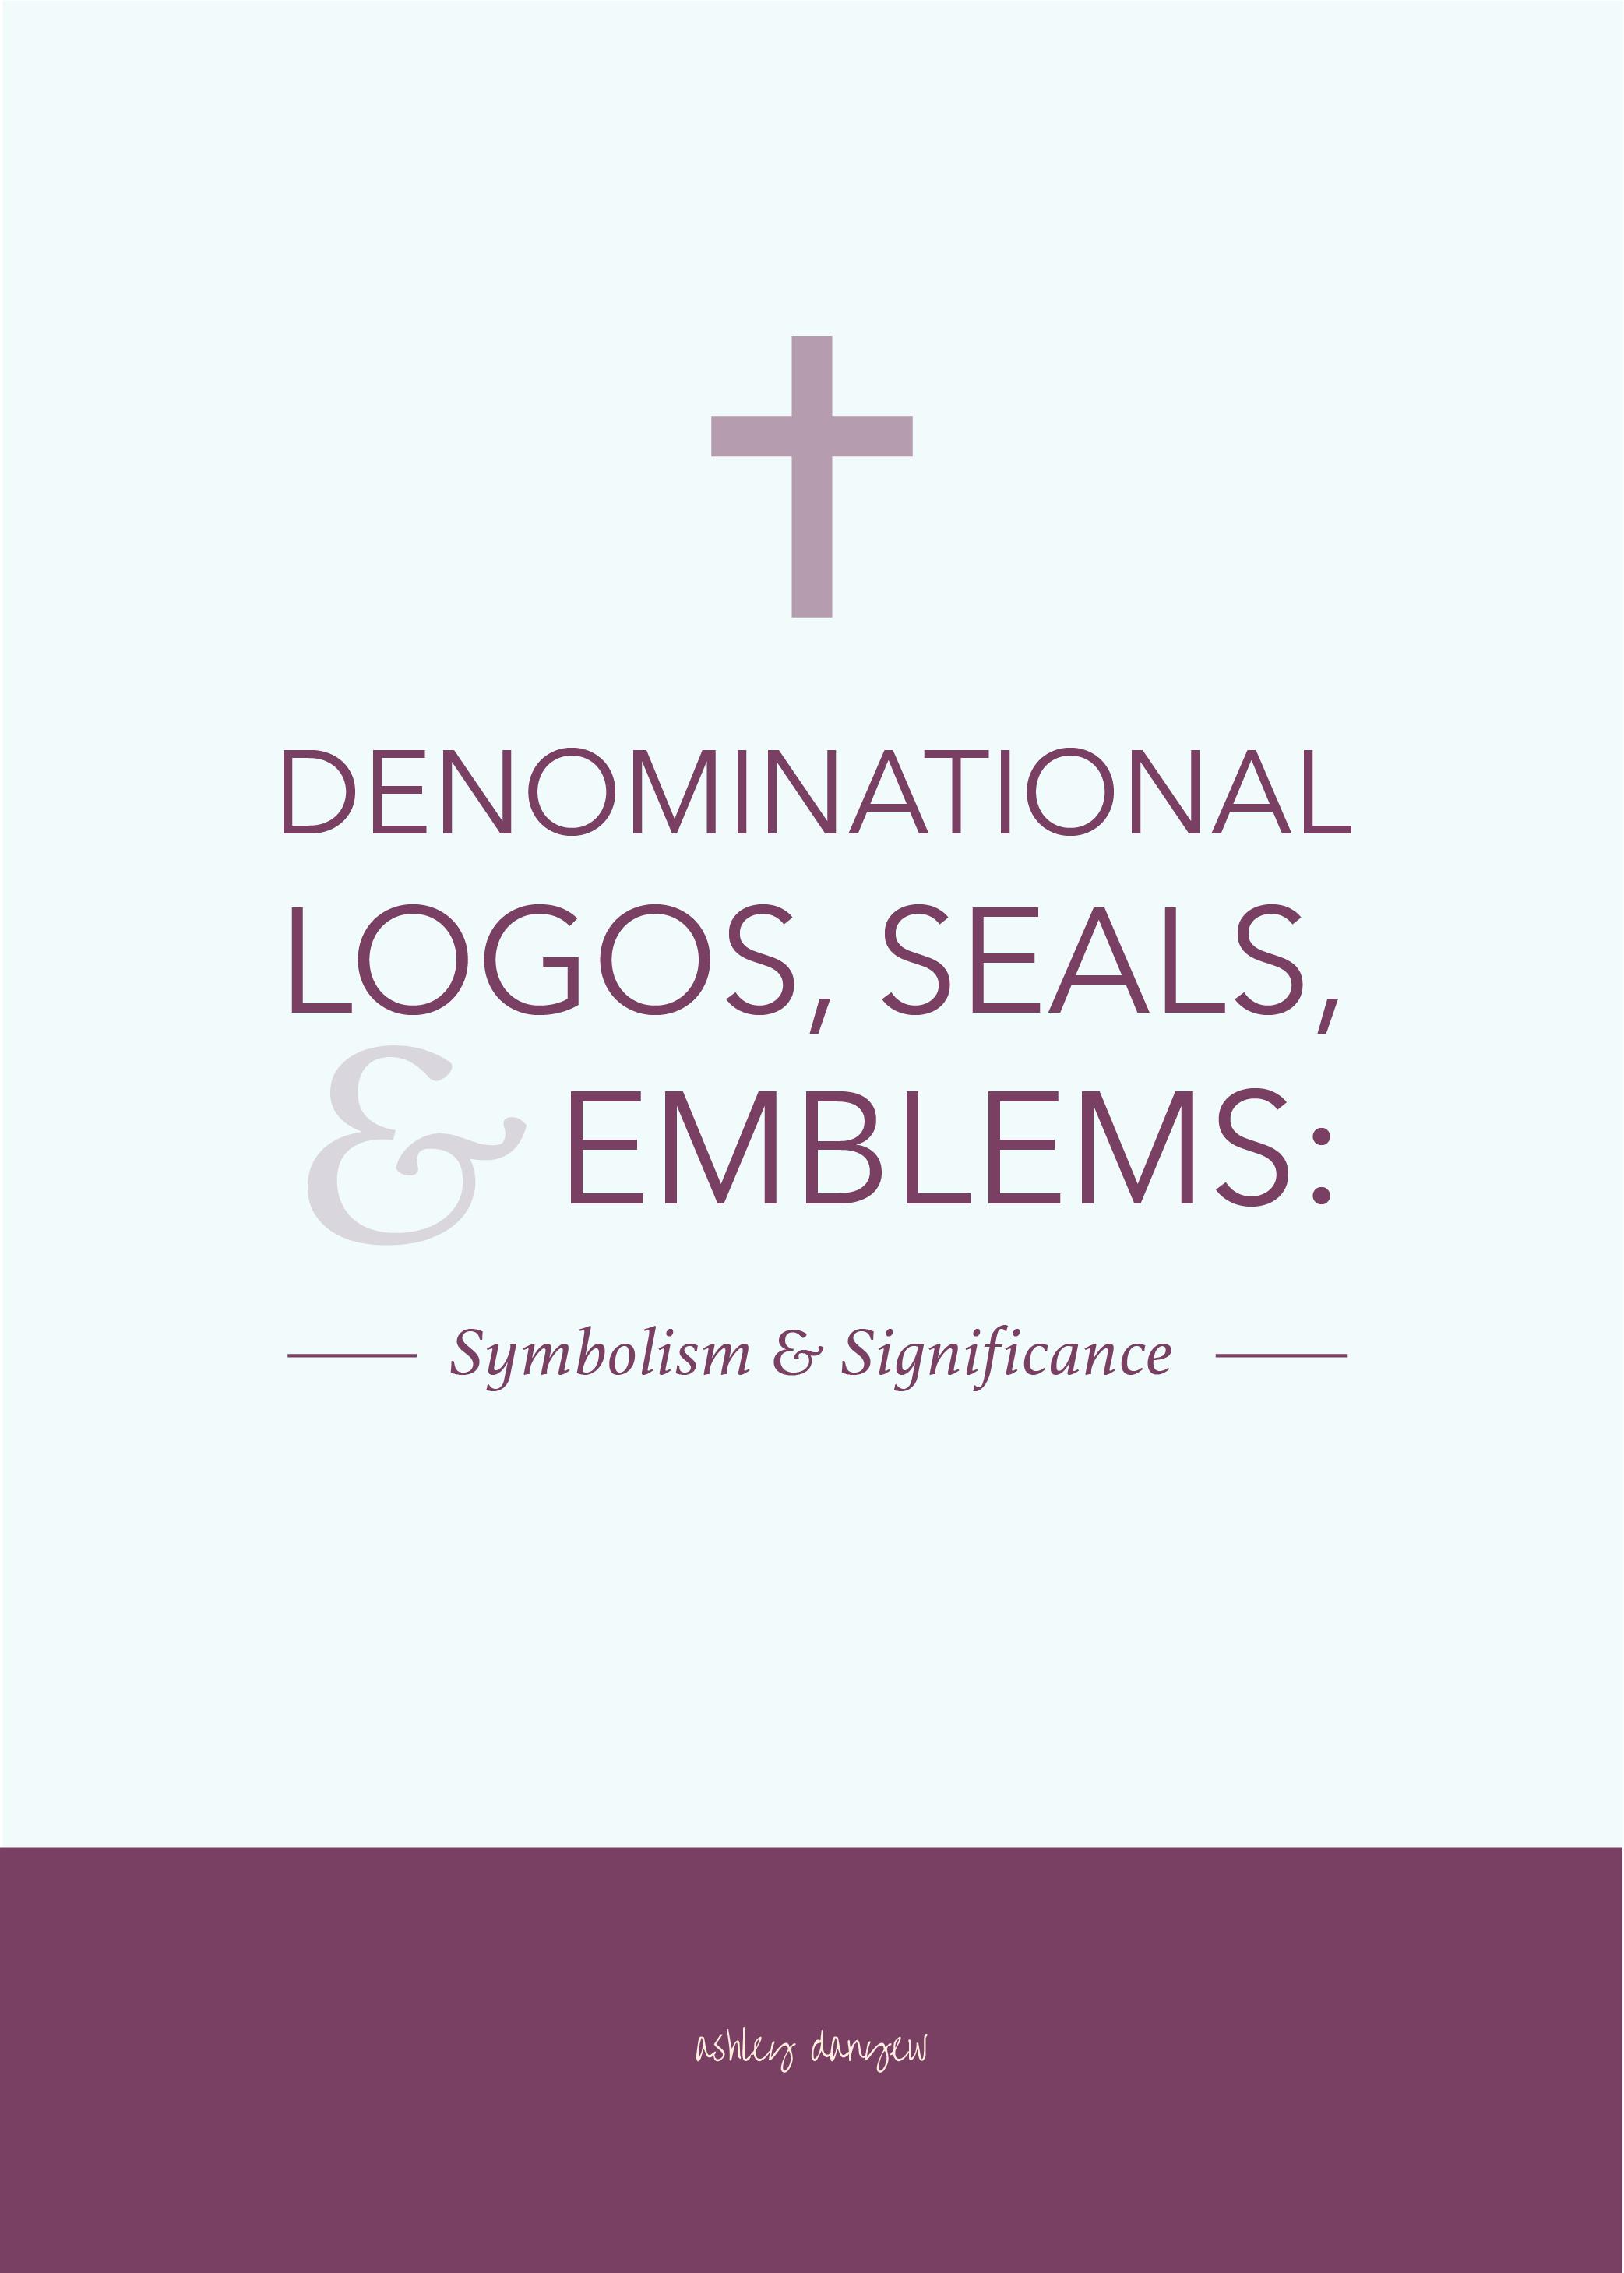 Denominational Logos, Seals, and Emblems-34.png